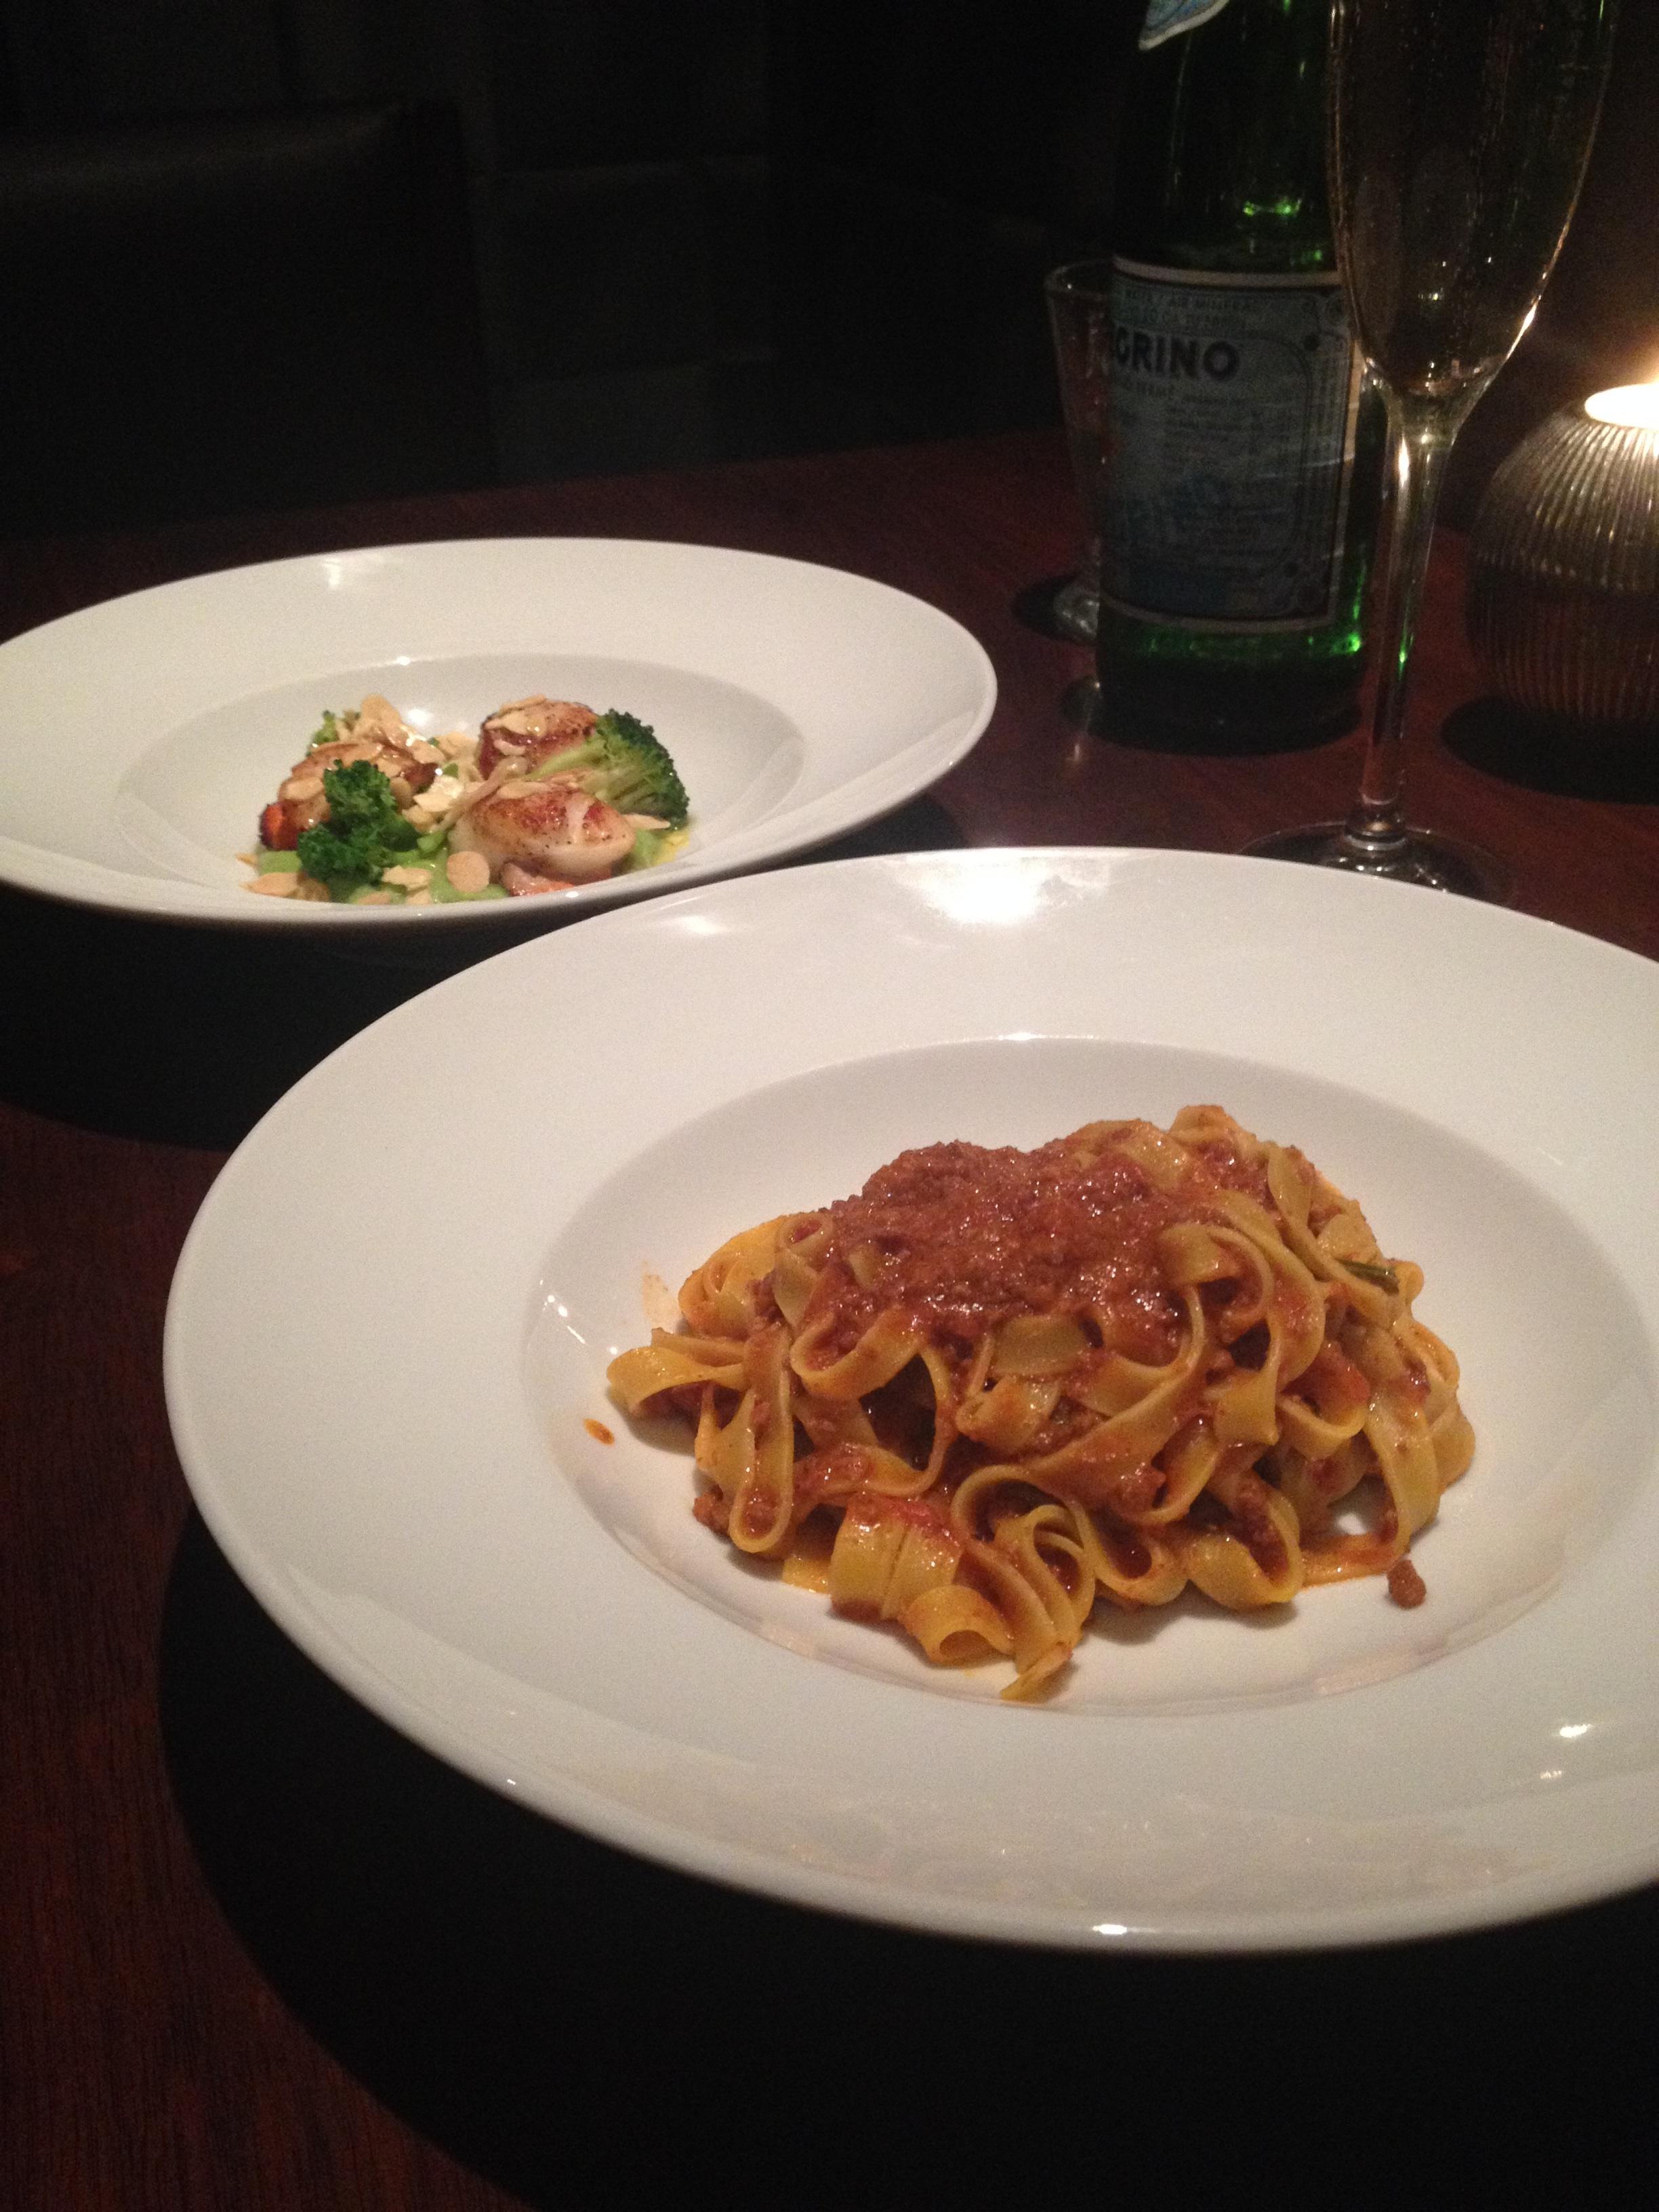 Diciannove – Tagliatelle al ragu with beef and pork ragout